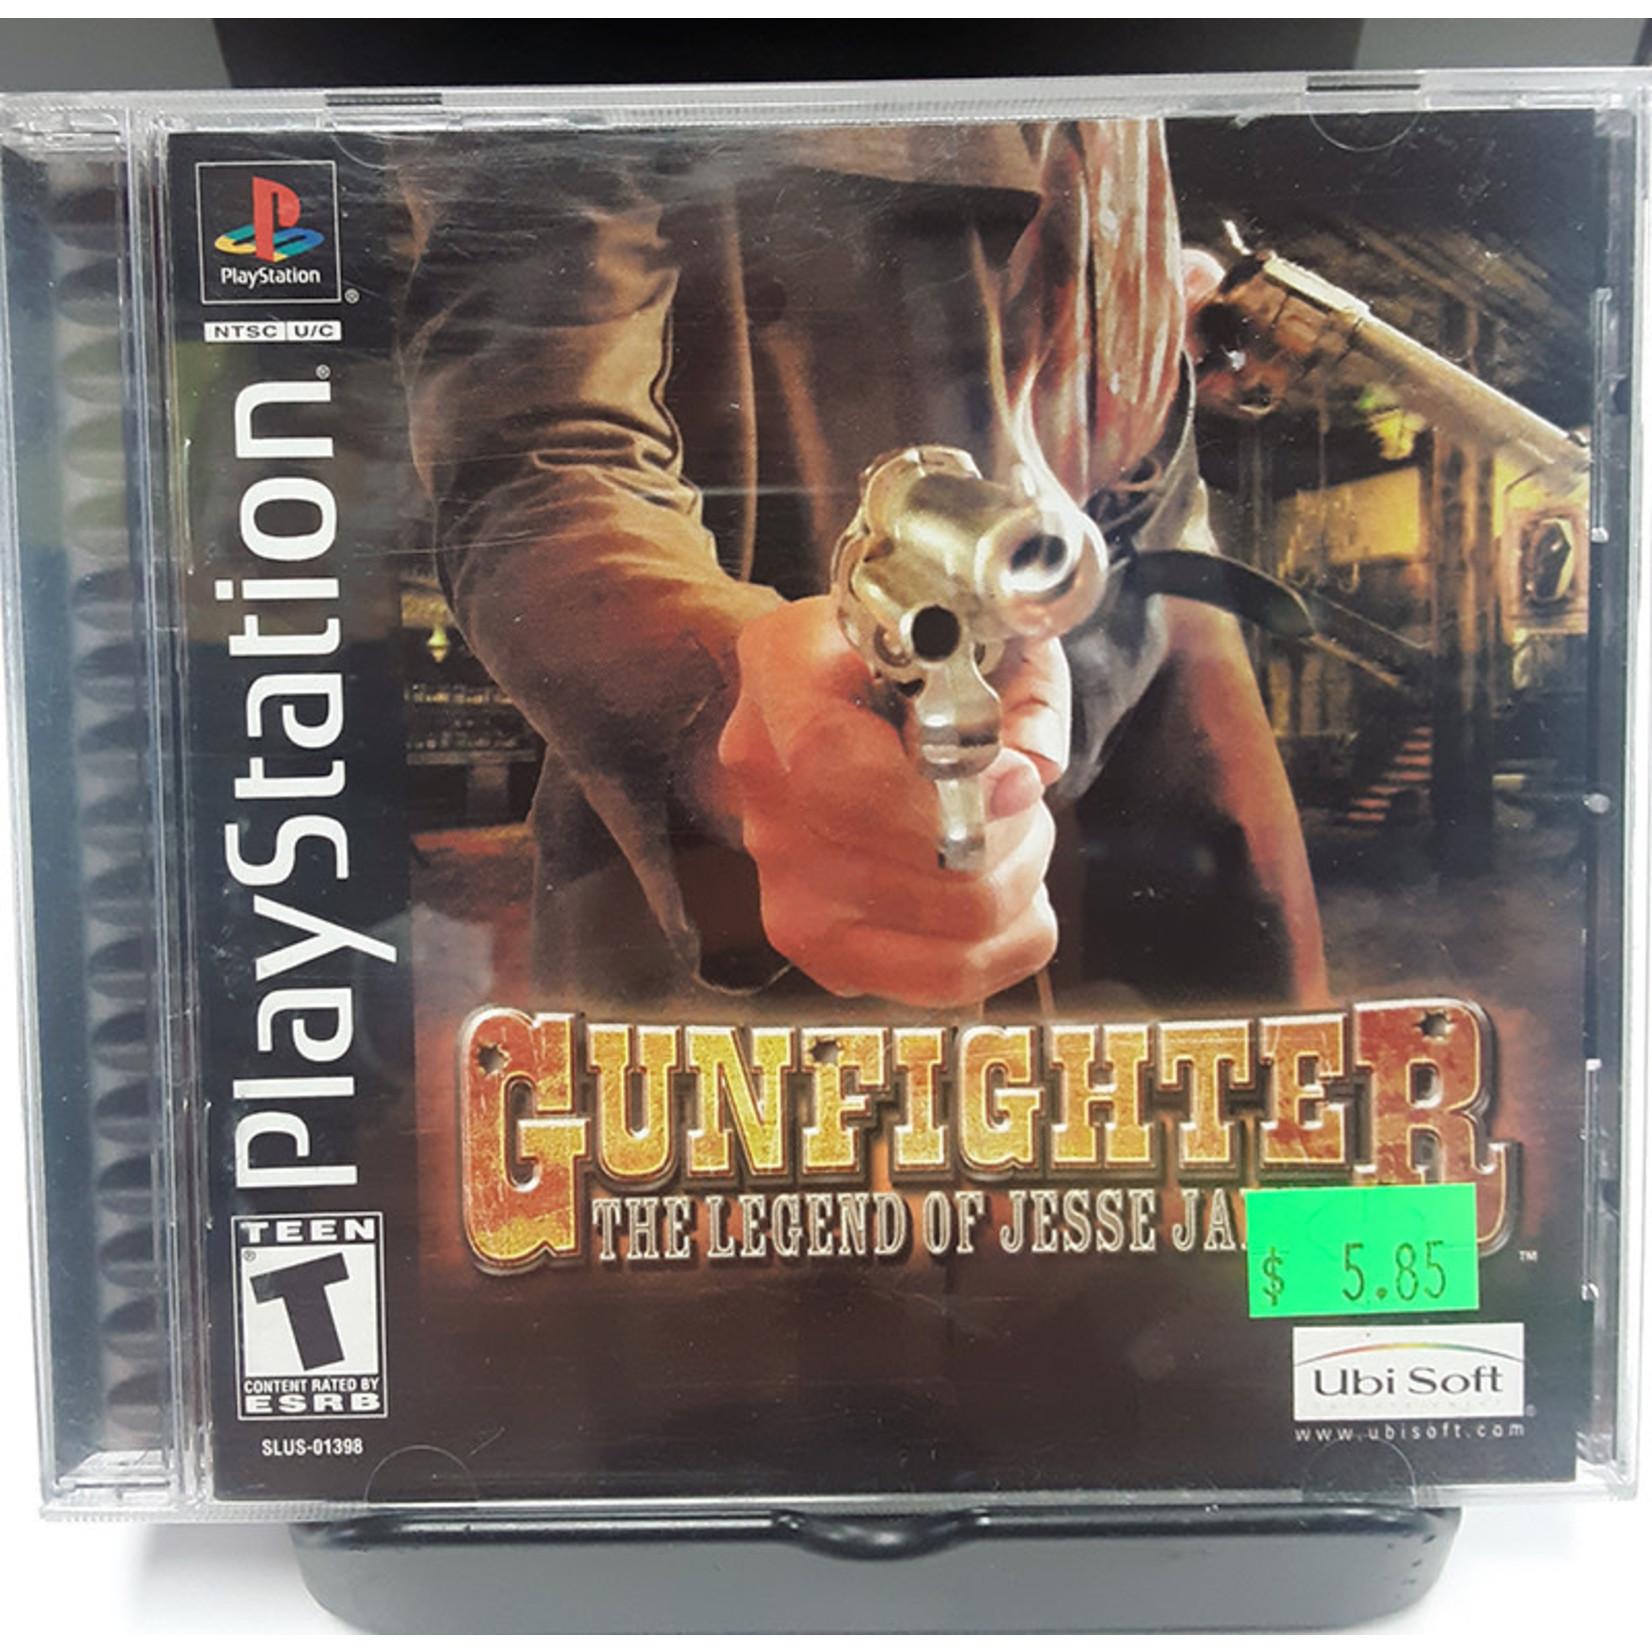 ps1u-Gunfighter The Legend of Jesse James